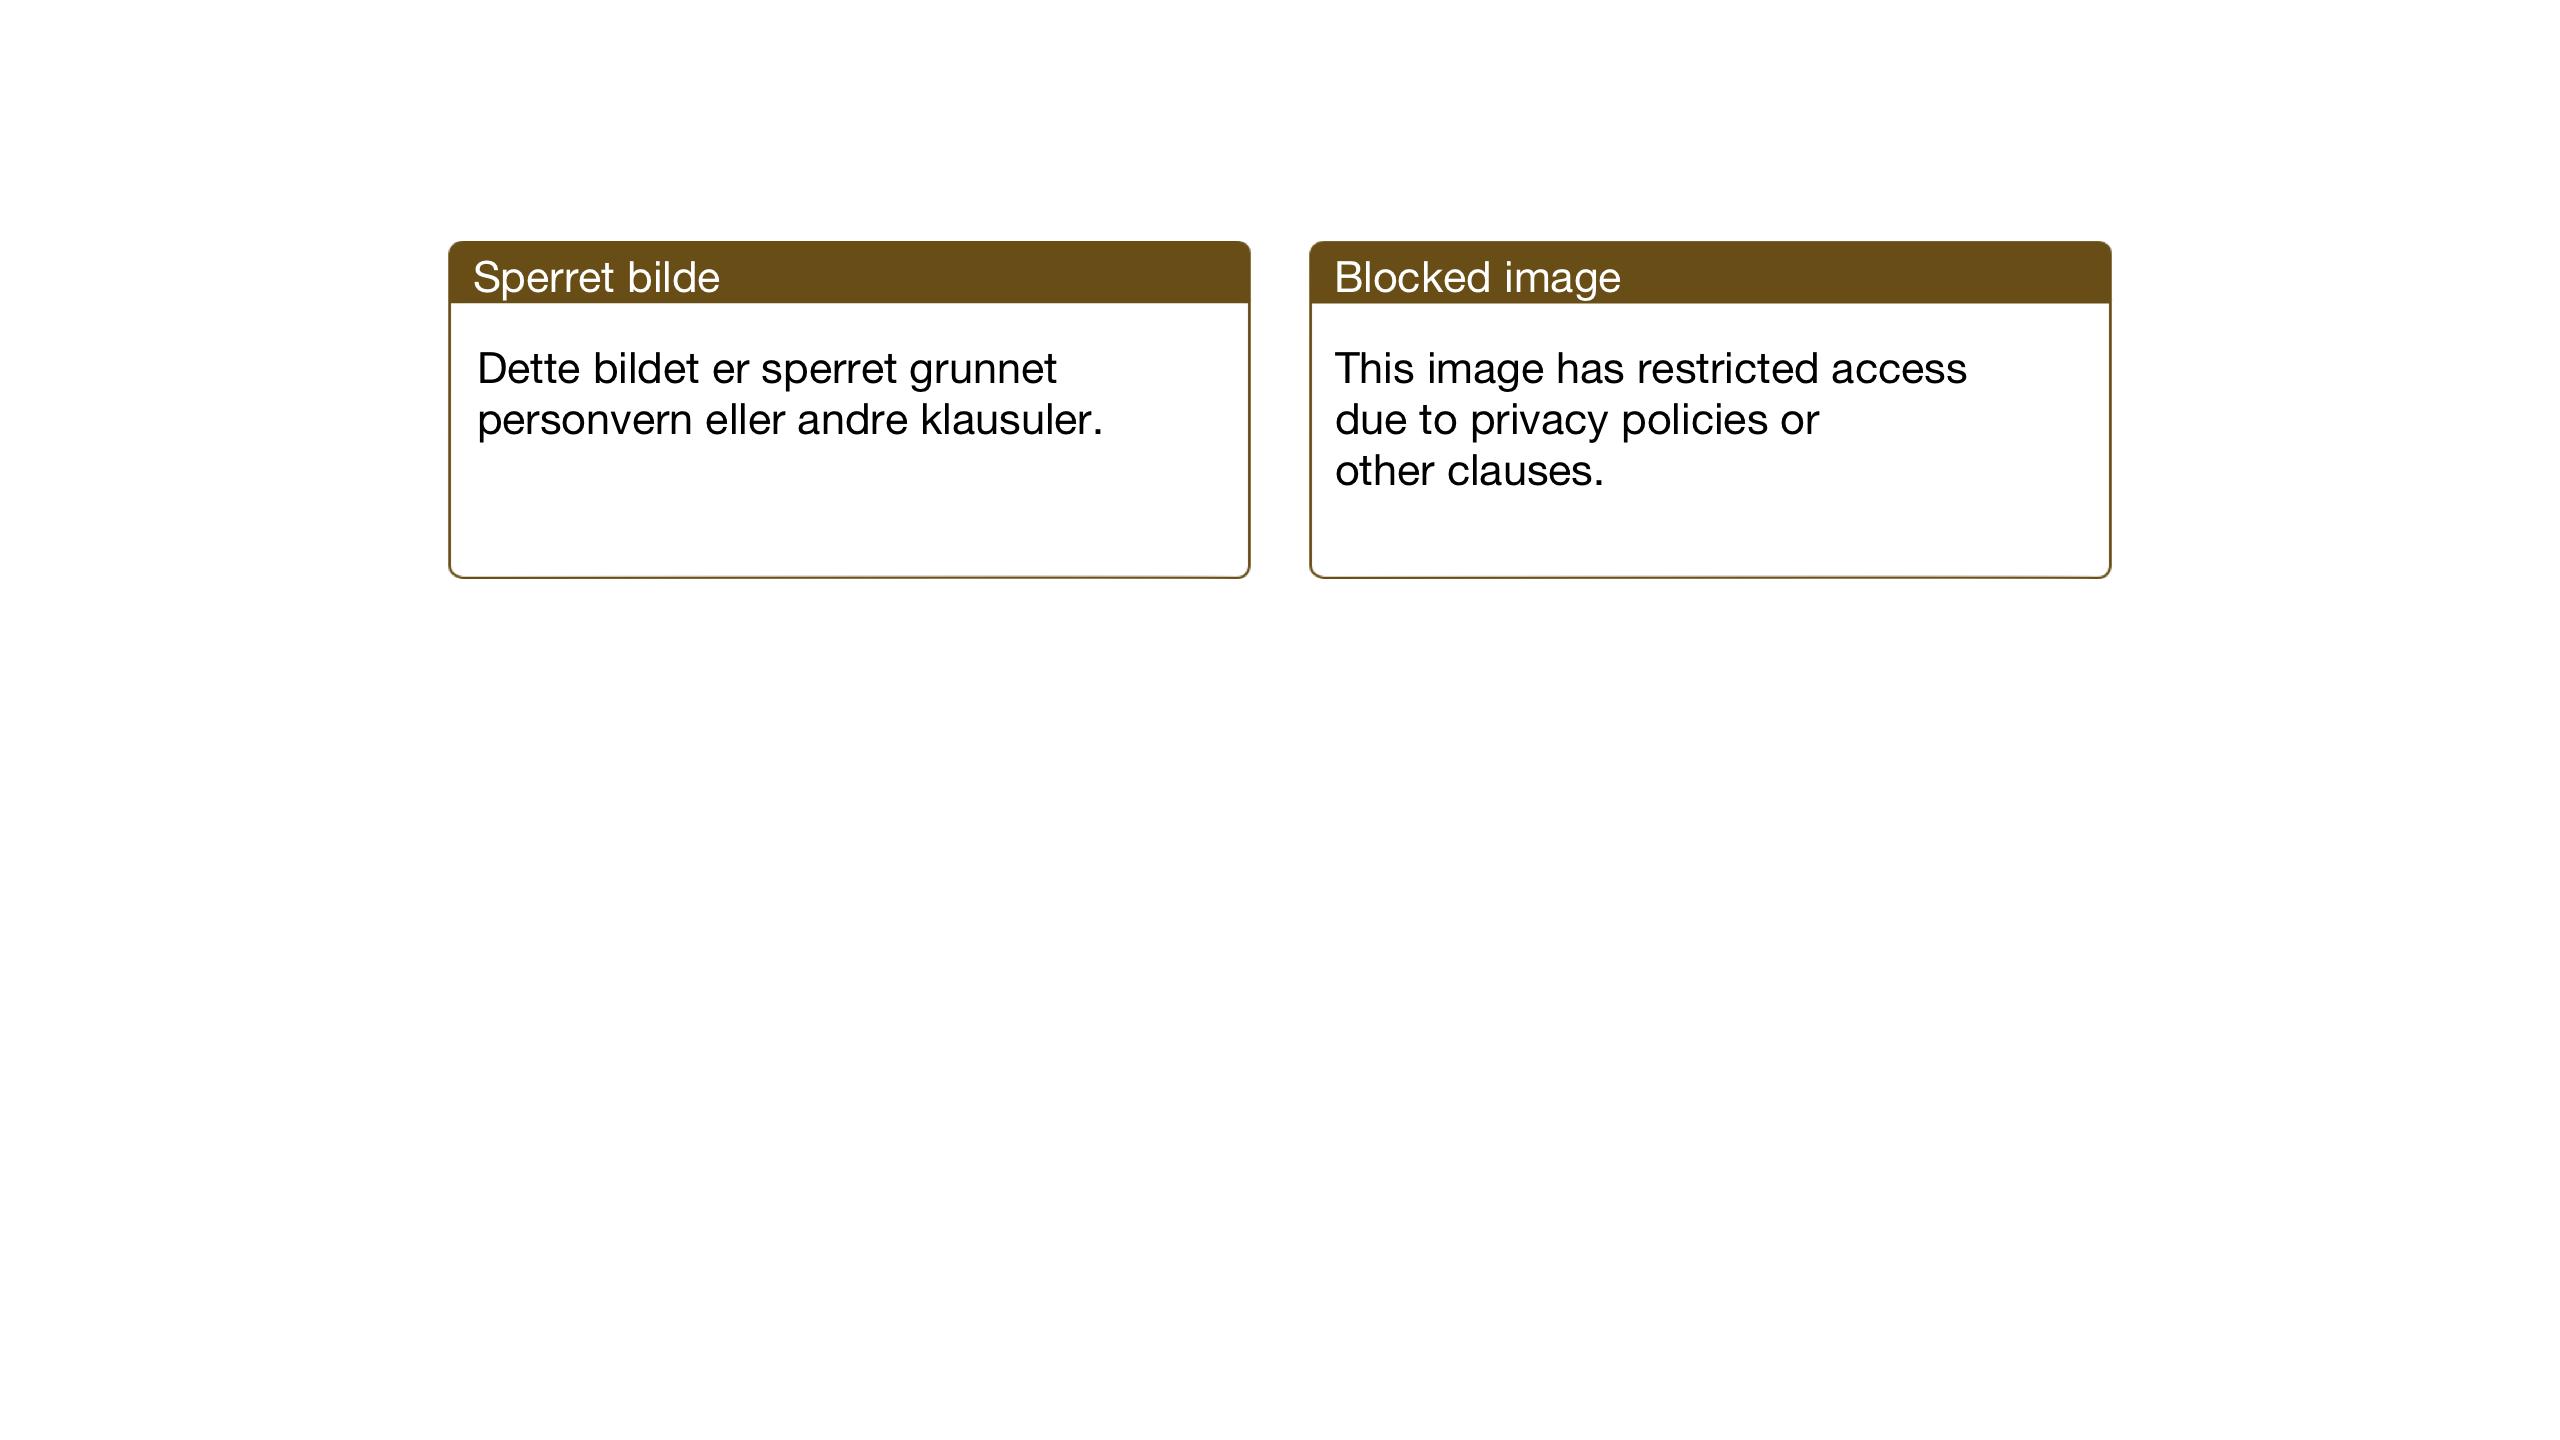 SAB, Domkirken Sokneprestembete, H/Haa: Ministerialbok nr. C 9, 1958-2001, s. 208b-209a